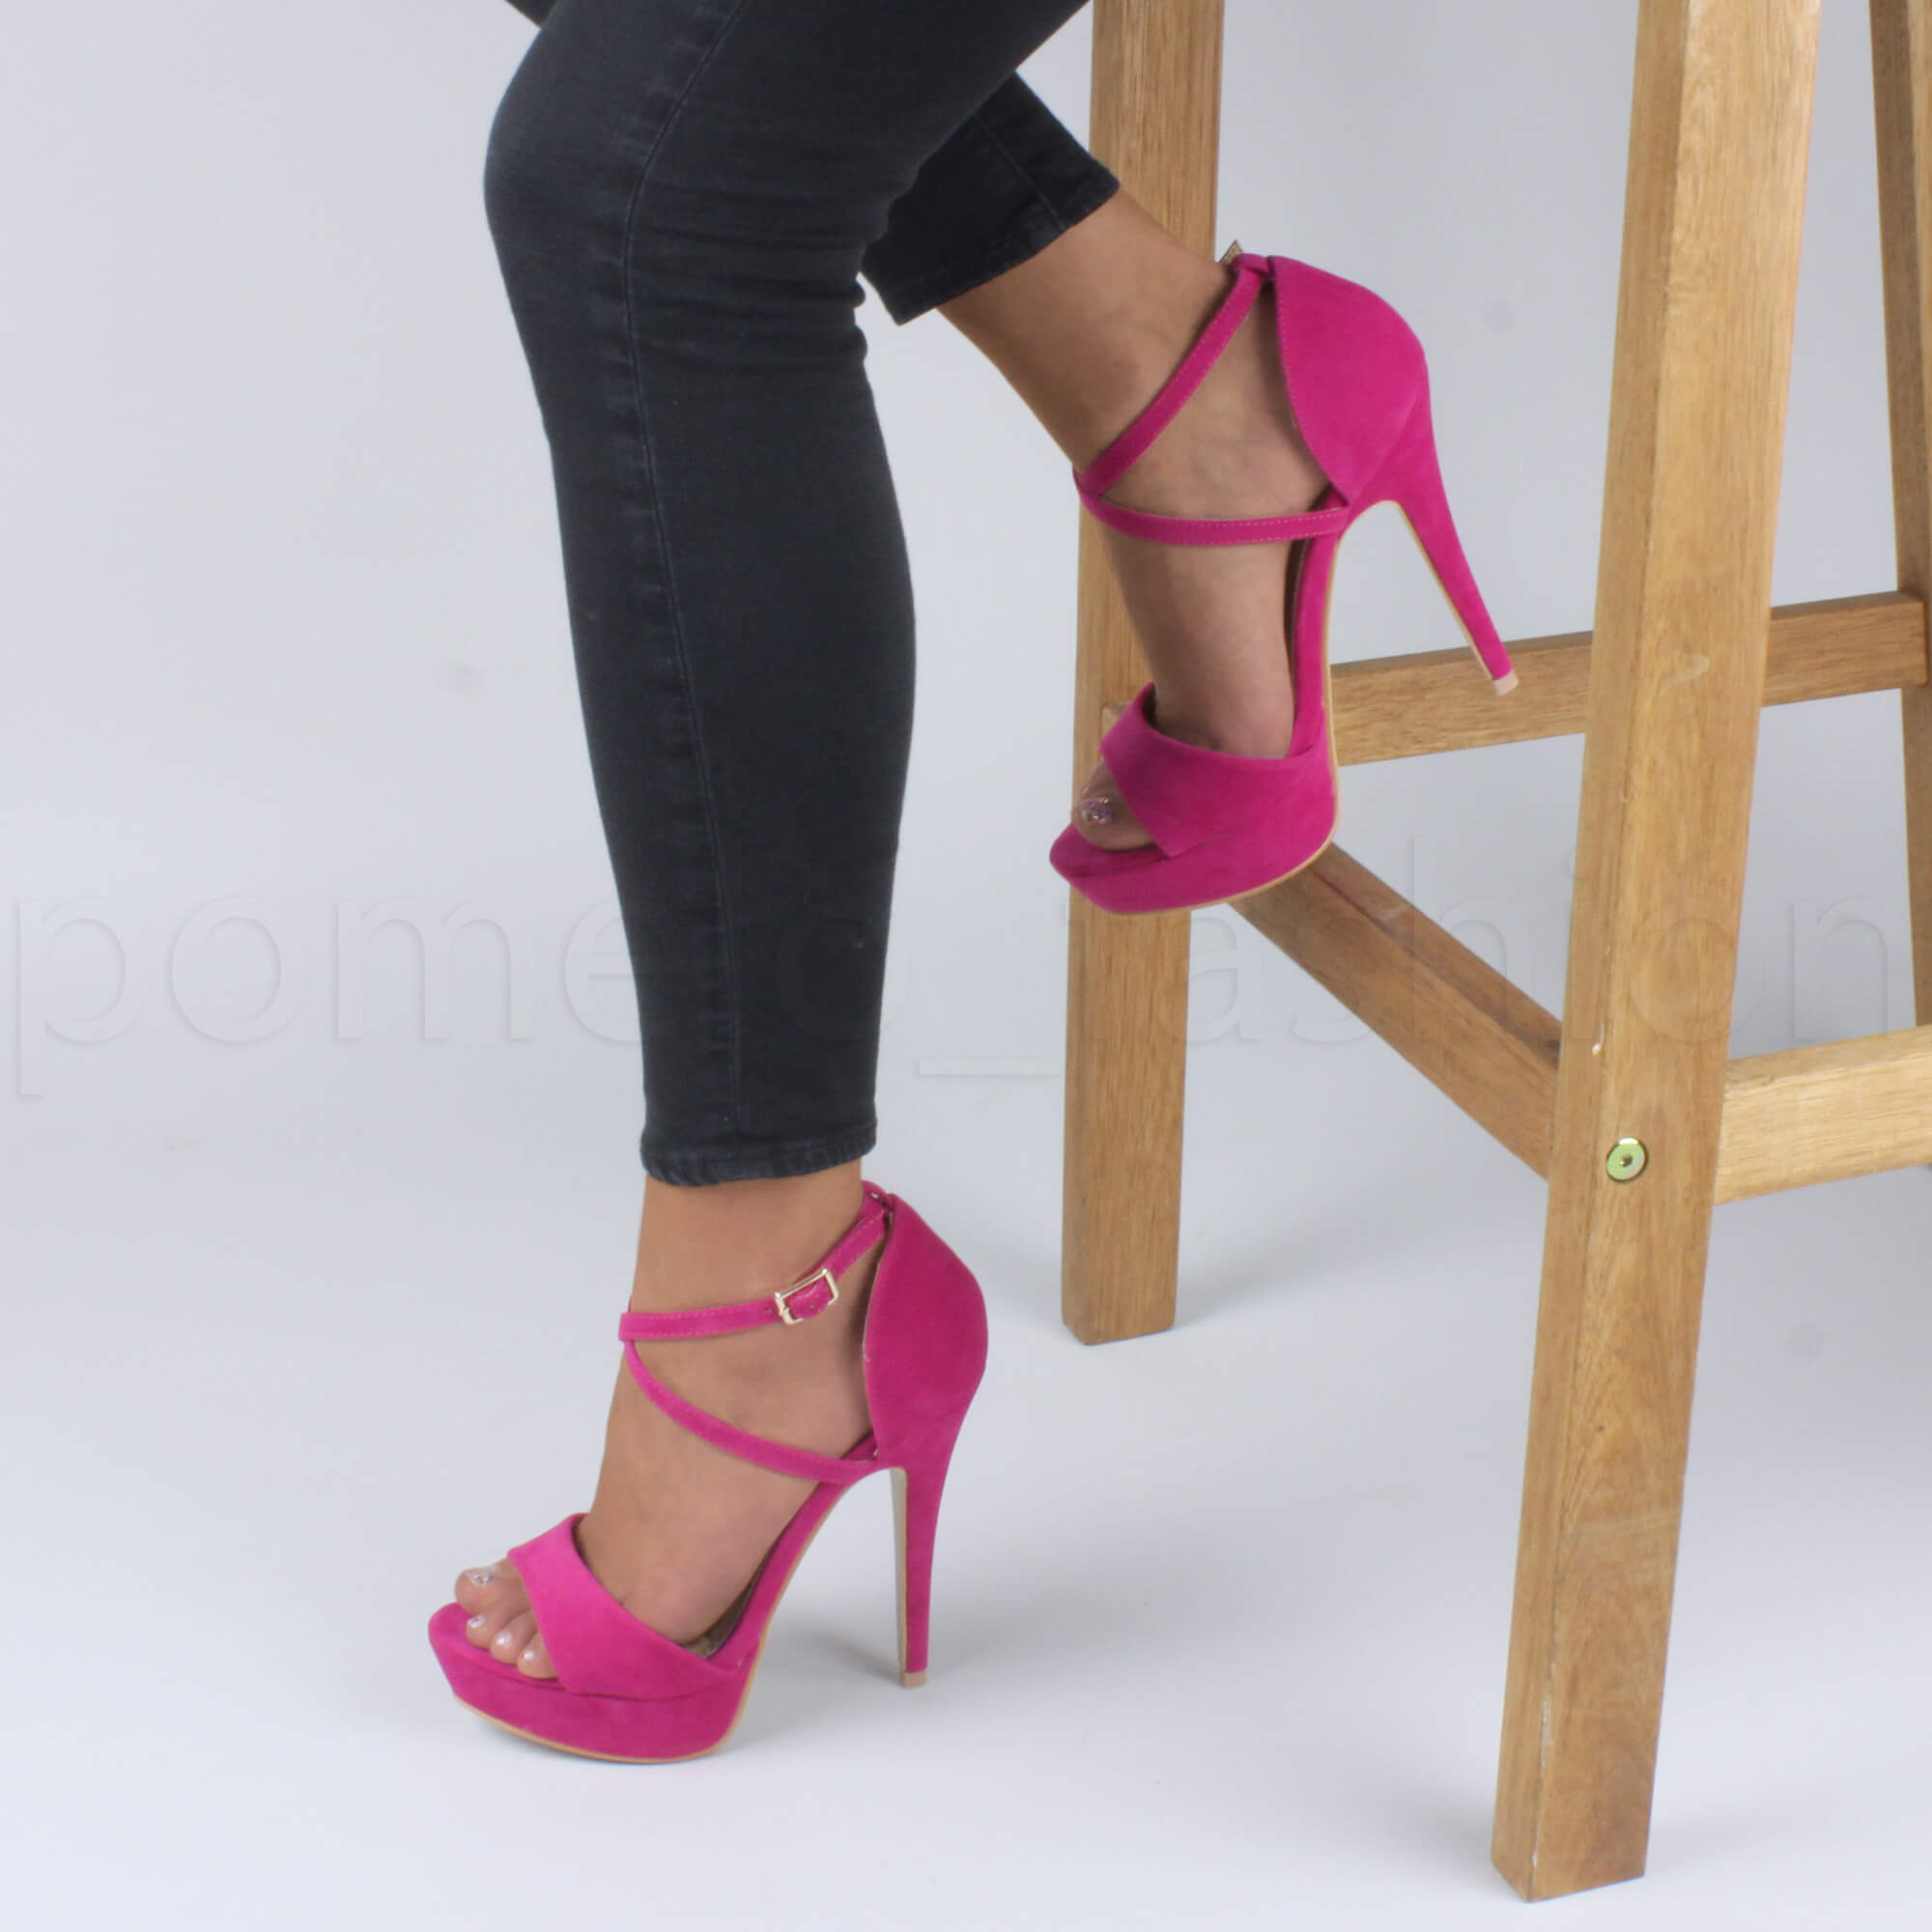 Womens ladies platform high heel peeptoe cross over strappy sandals shoes